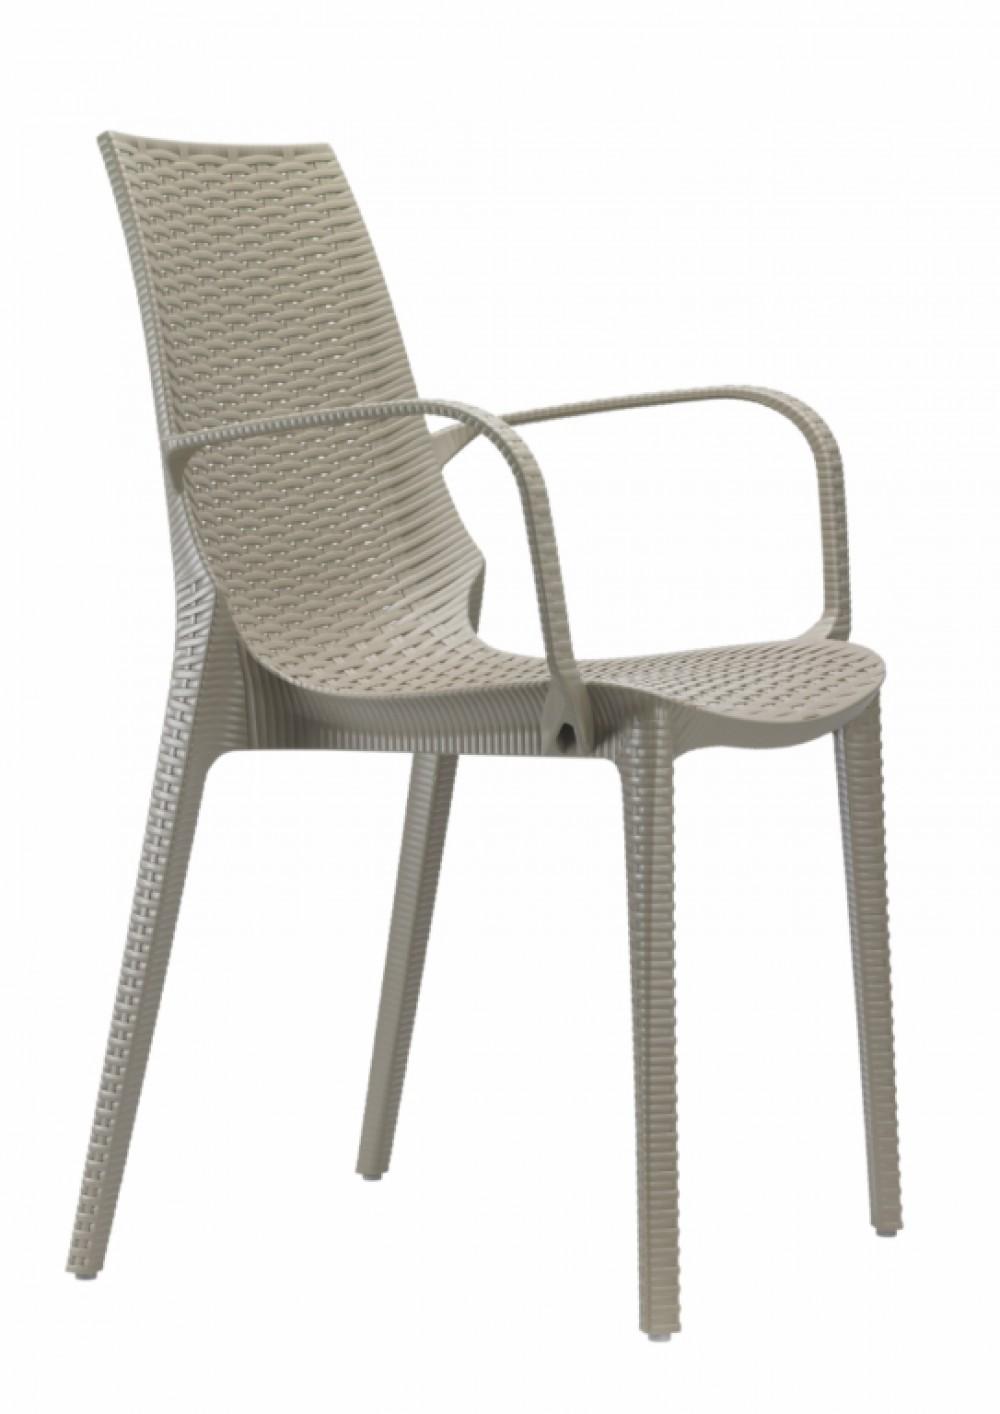 Design gartenm bel stuhl kunststoff taubengrau glasfaser for Design stuhl kunststoff